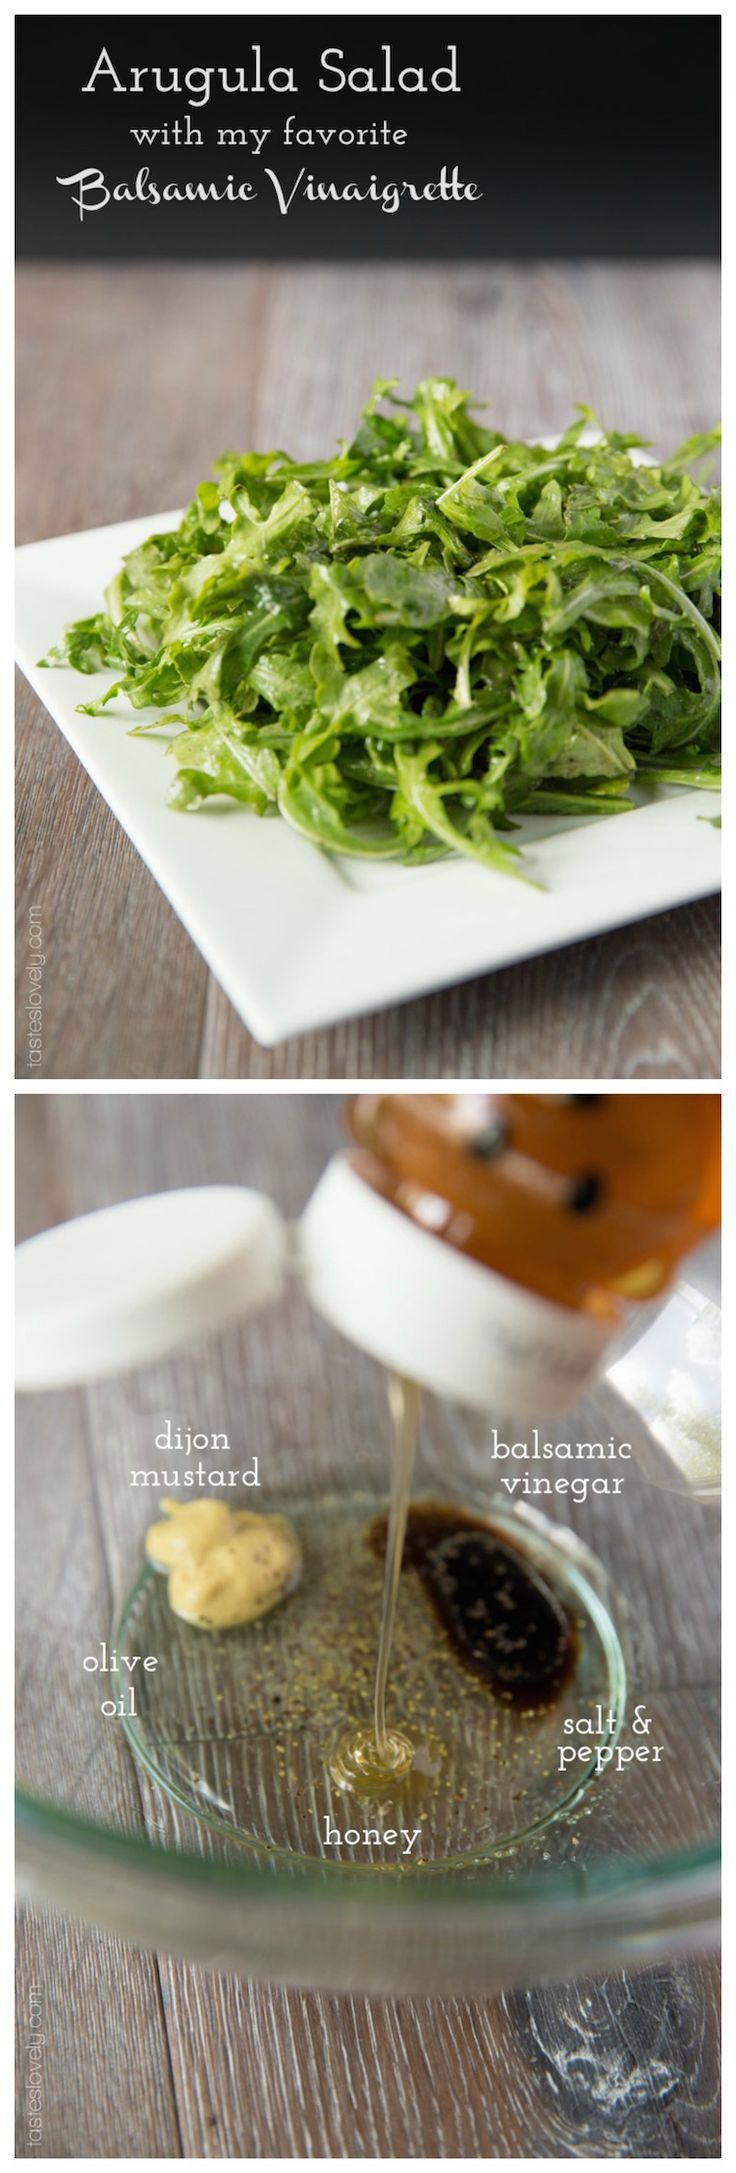 Arugula Salad with my favorite Balsamic Vinaigrette (just olive oil, dijon, balsamic, and honey)